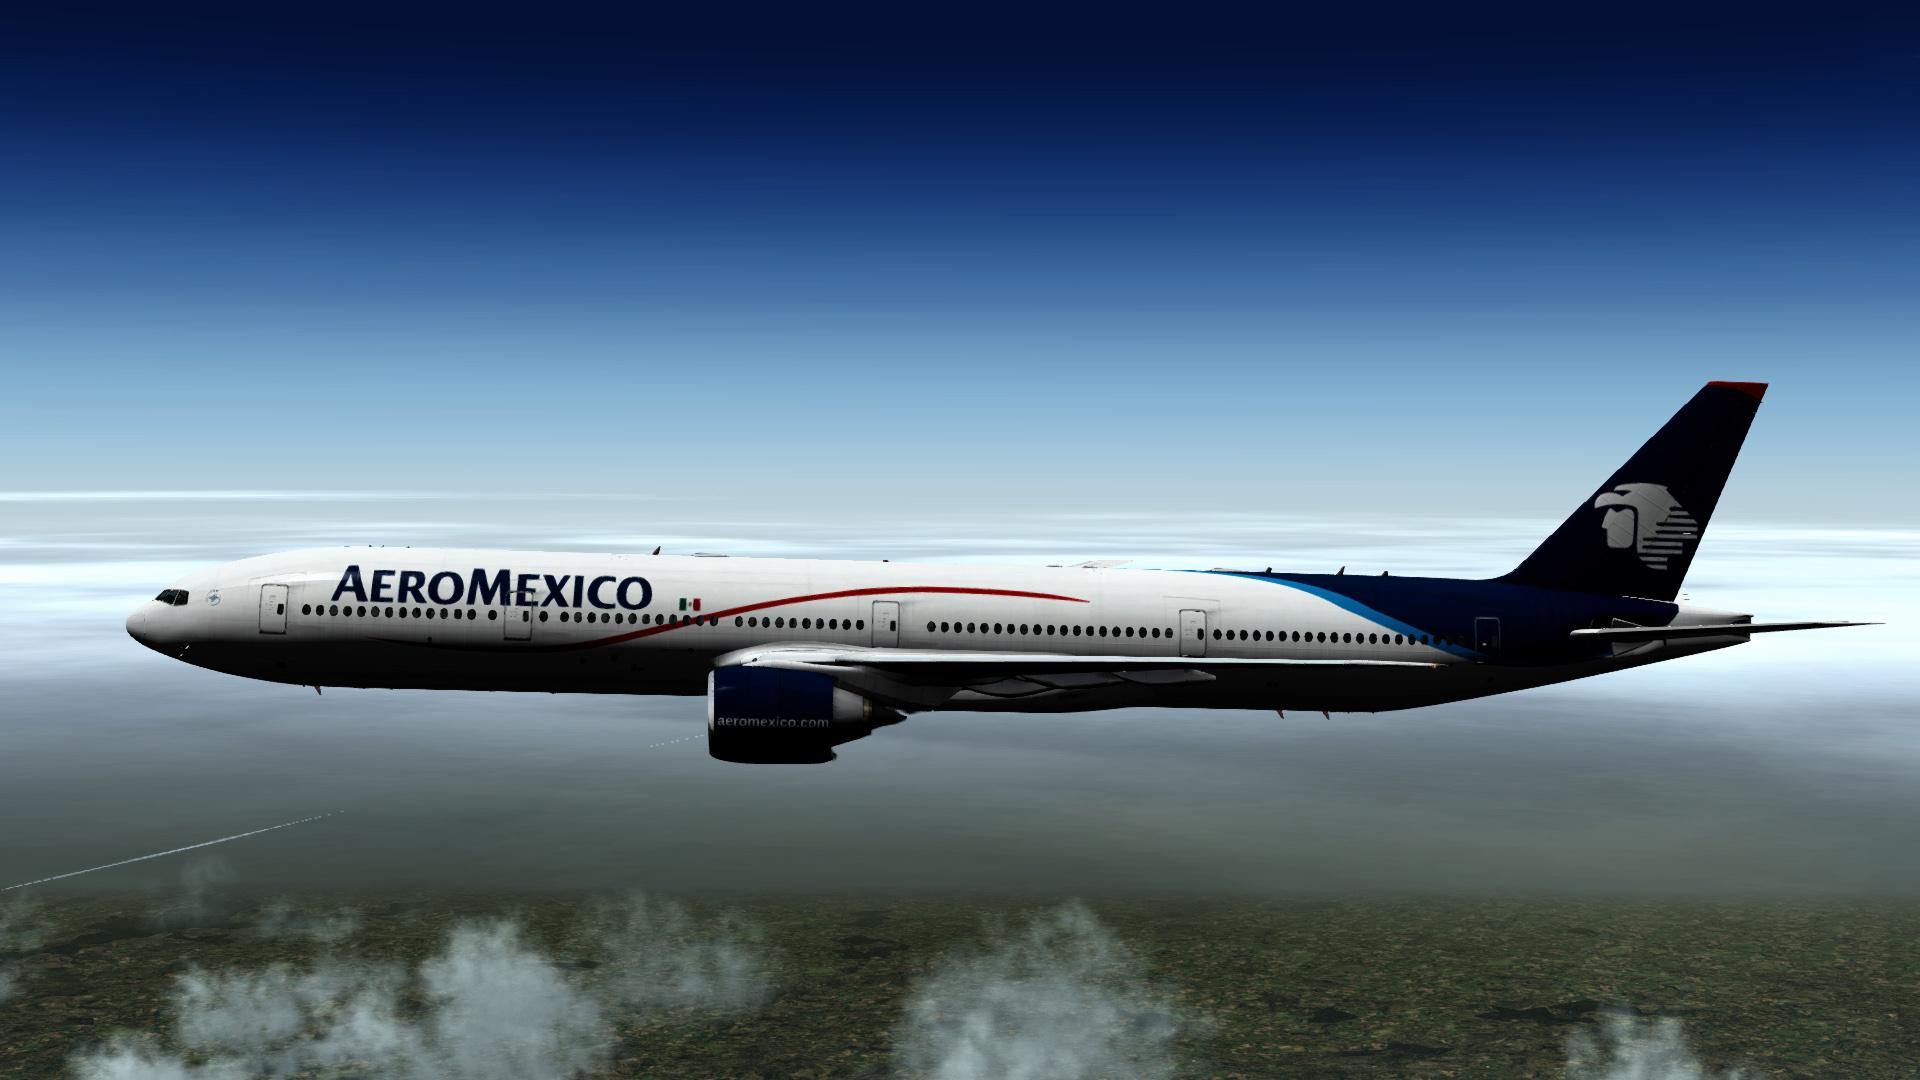 New AeroMexico - Boeing 777-300ER - Aircraft Skins - Liveries - X